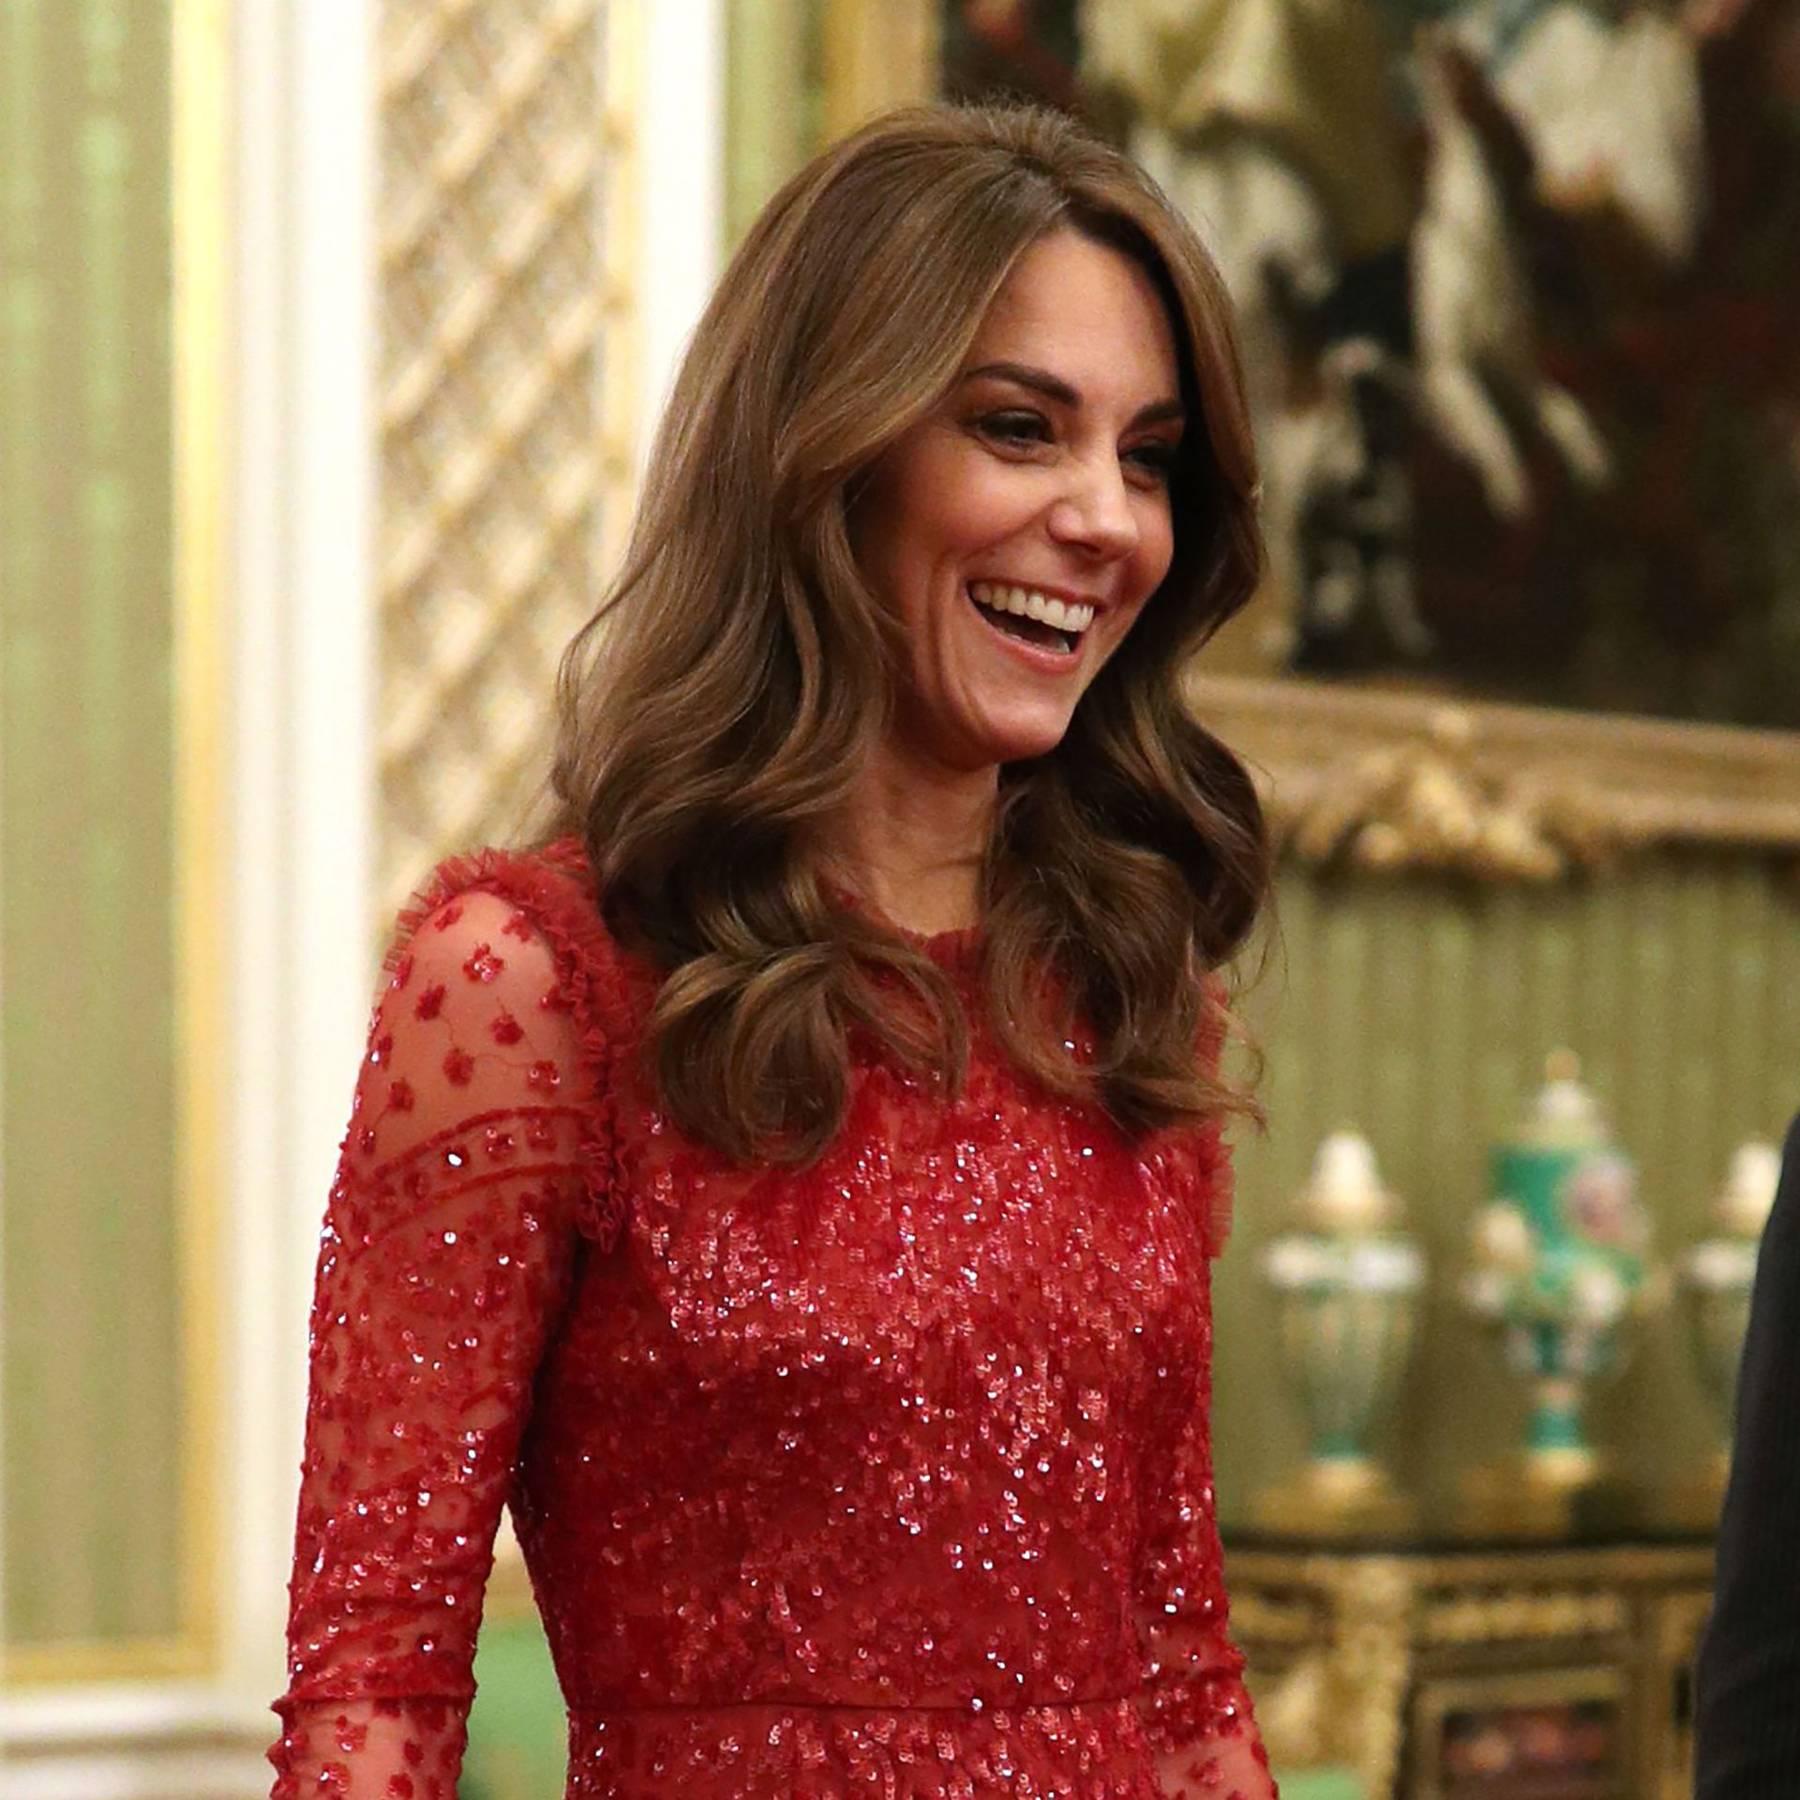 The Duchess of Cambridge wears Needle & Thread at Buckingham Palace